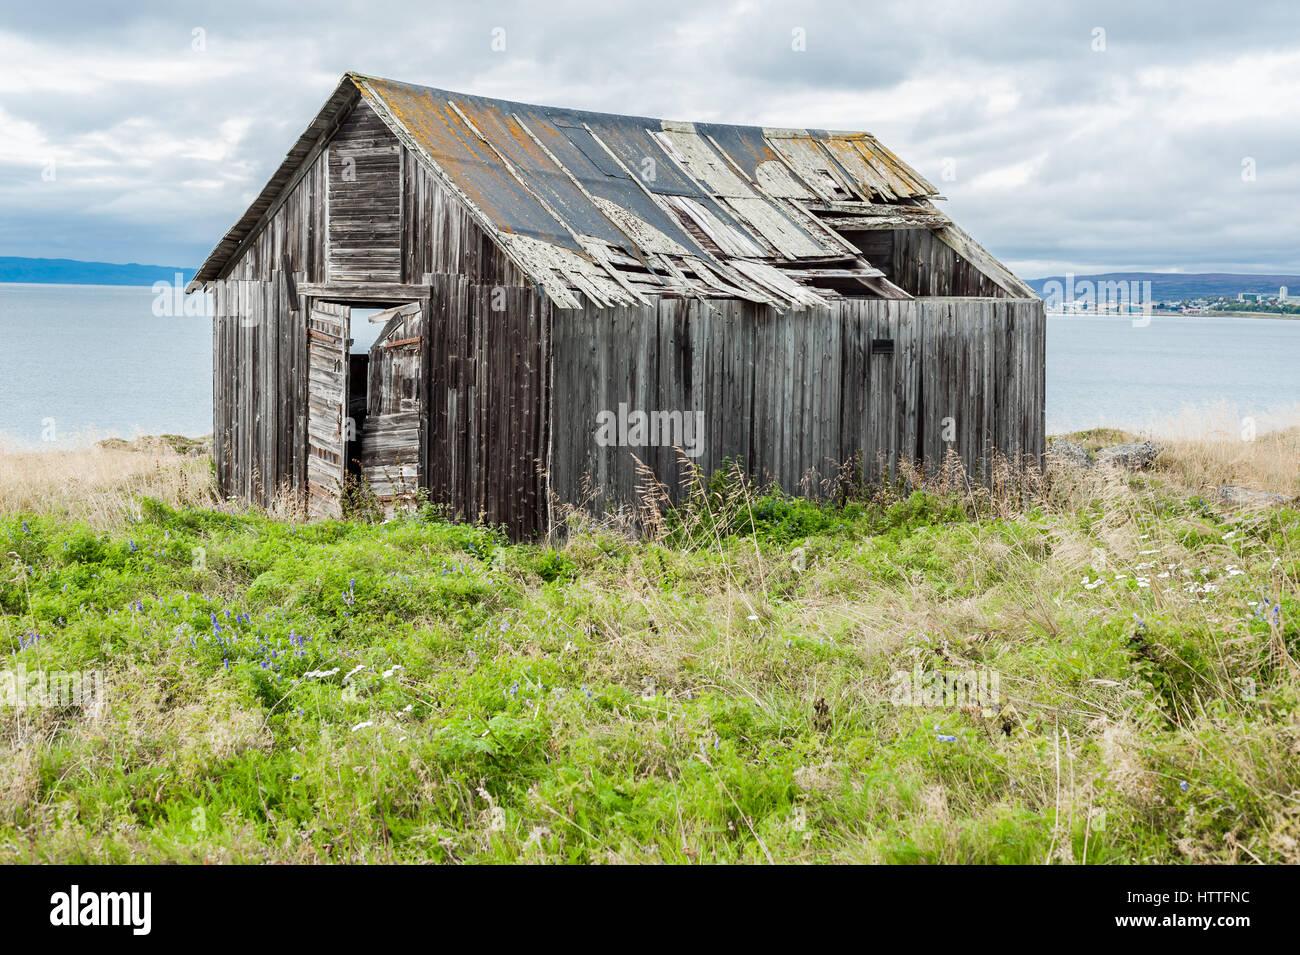 Old wooden decrepit cabin in need of repair with damaged roof and broken door - Stock Image